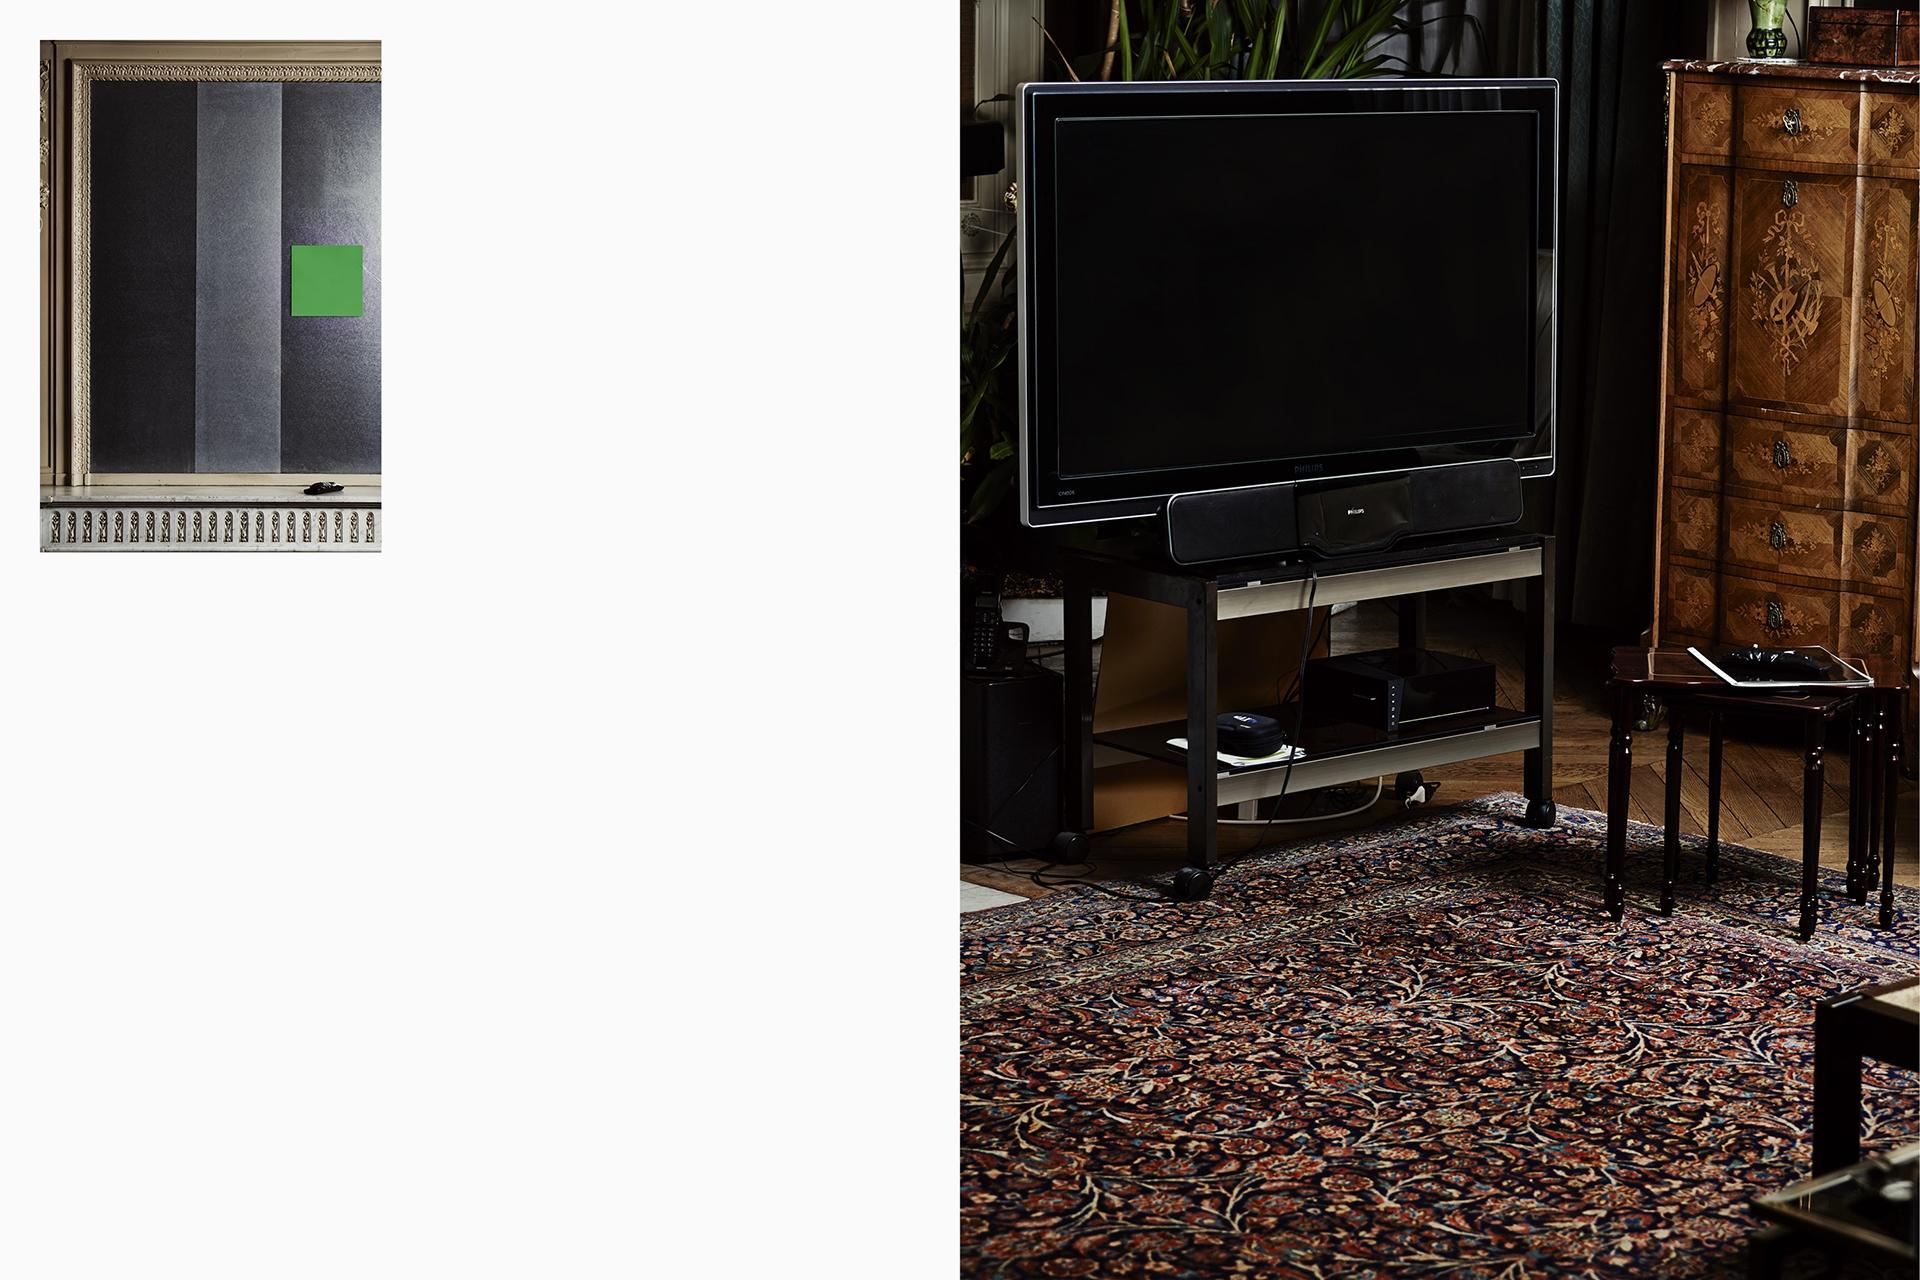 Télévision N1 1412 BC 040 076 ANDRE (BC)